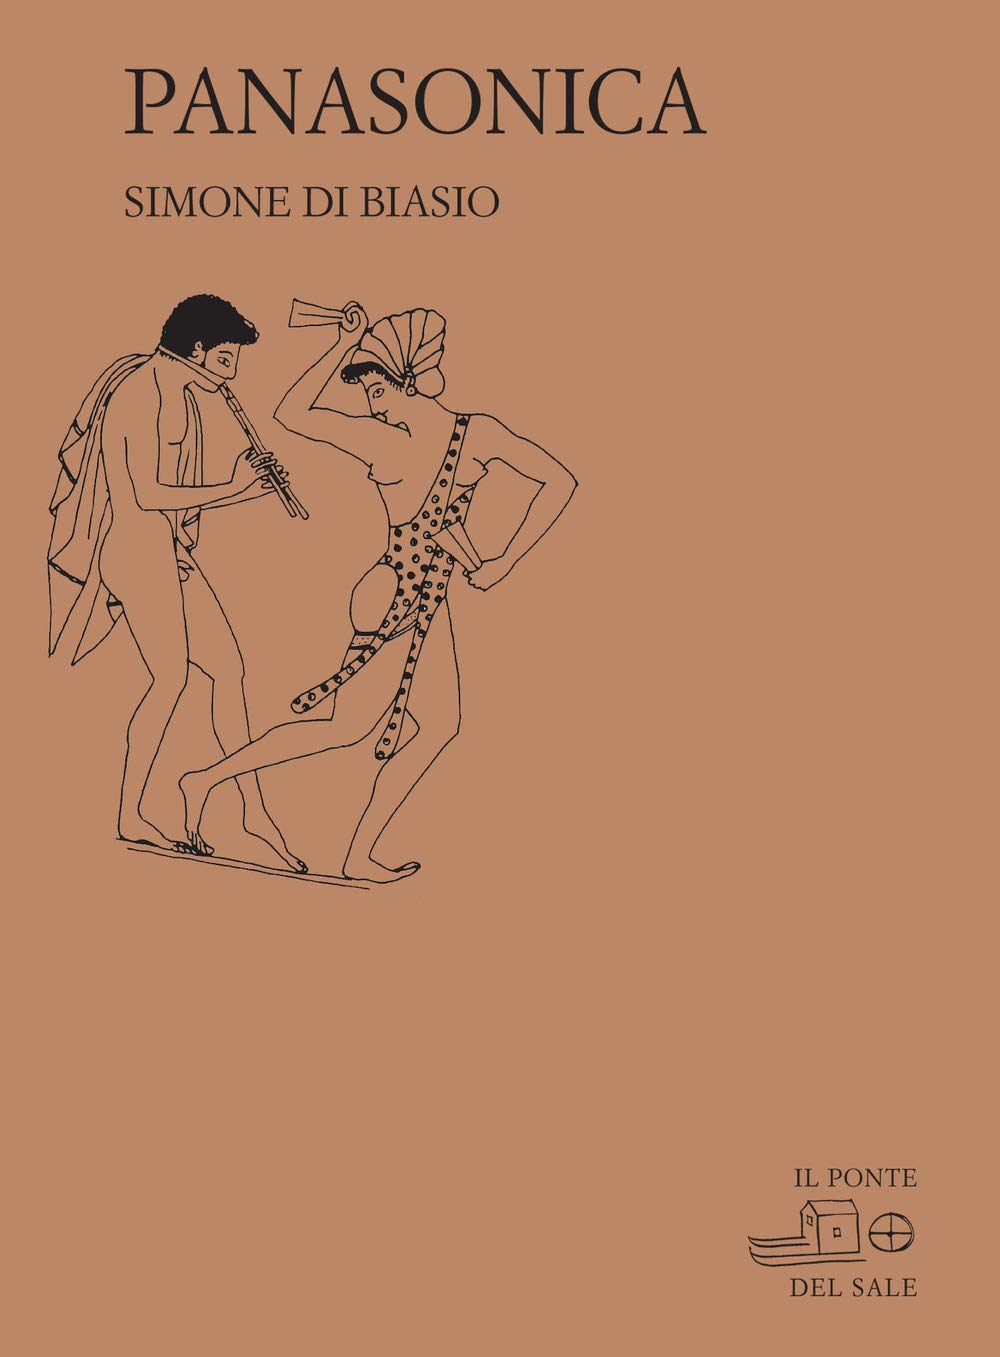 Panasonica – Simone di Biasio